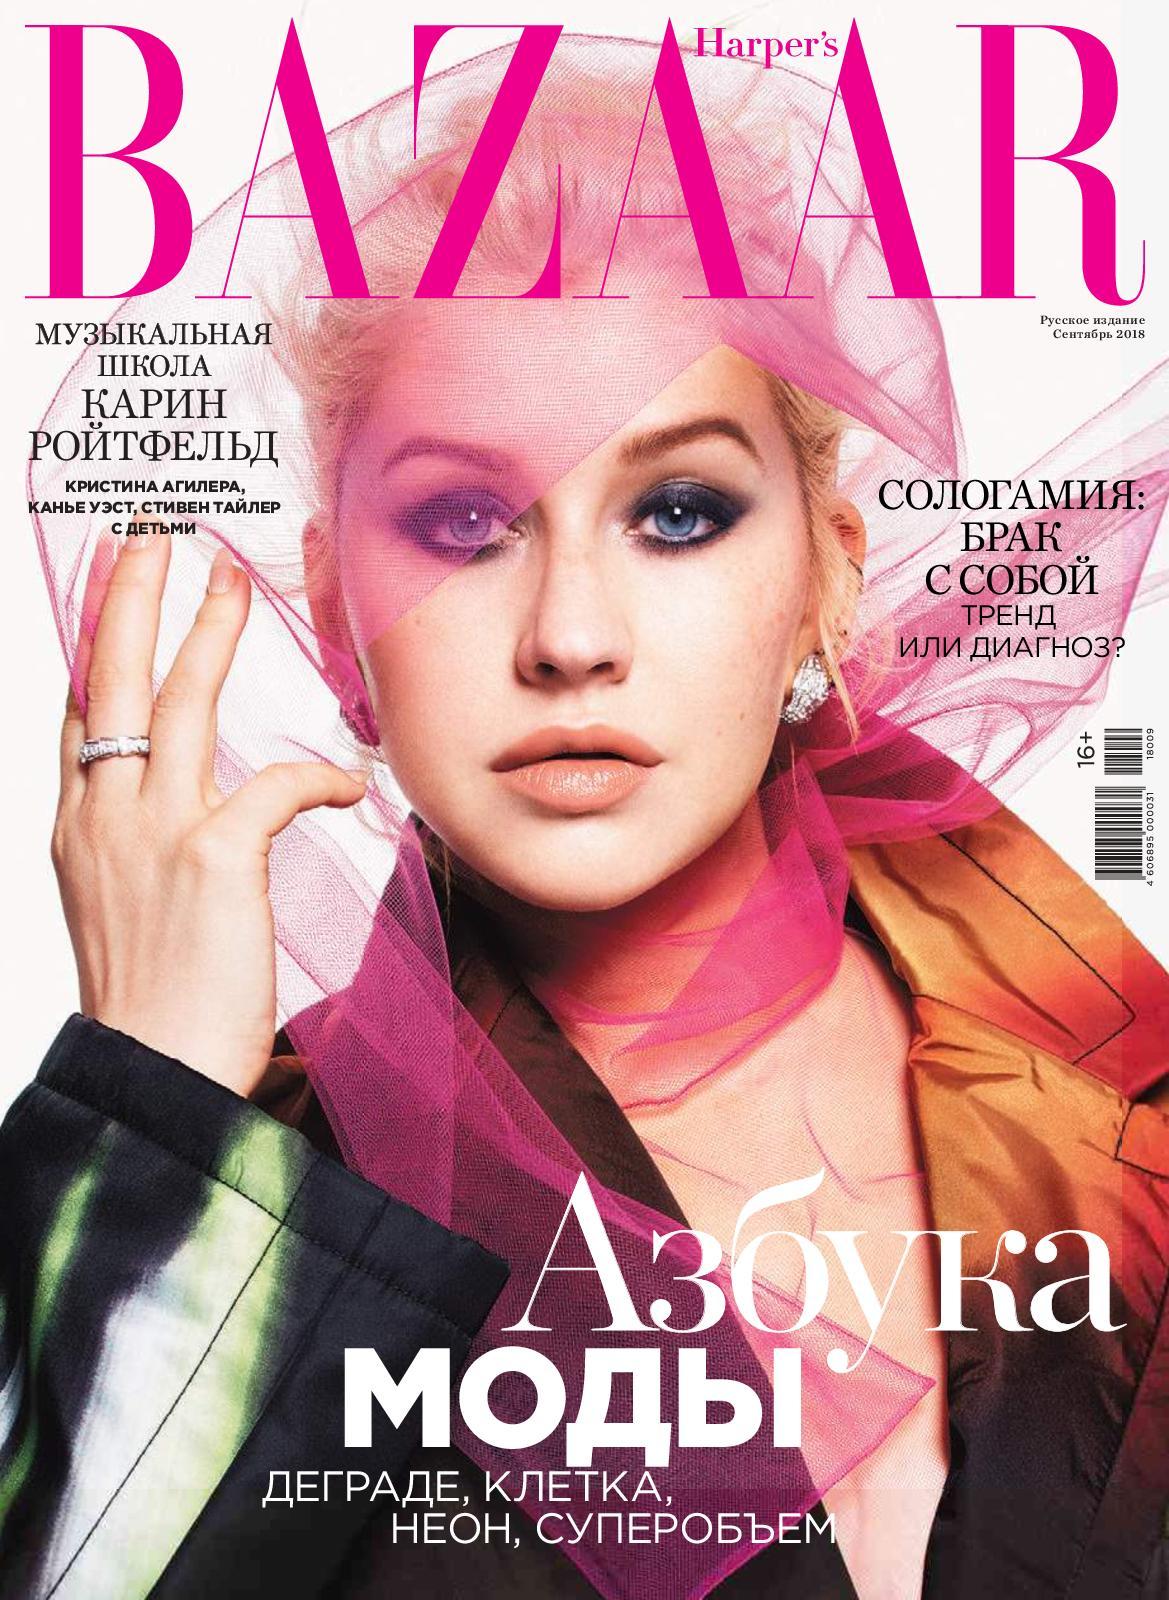 Calaméo - Harper s Bazaar №31 2018 0d08d916619